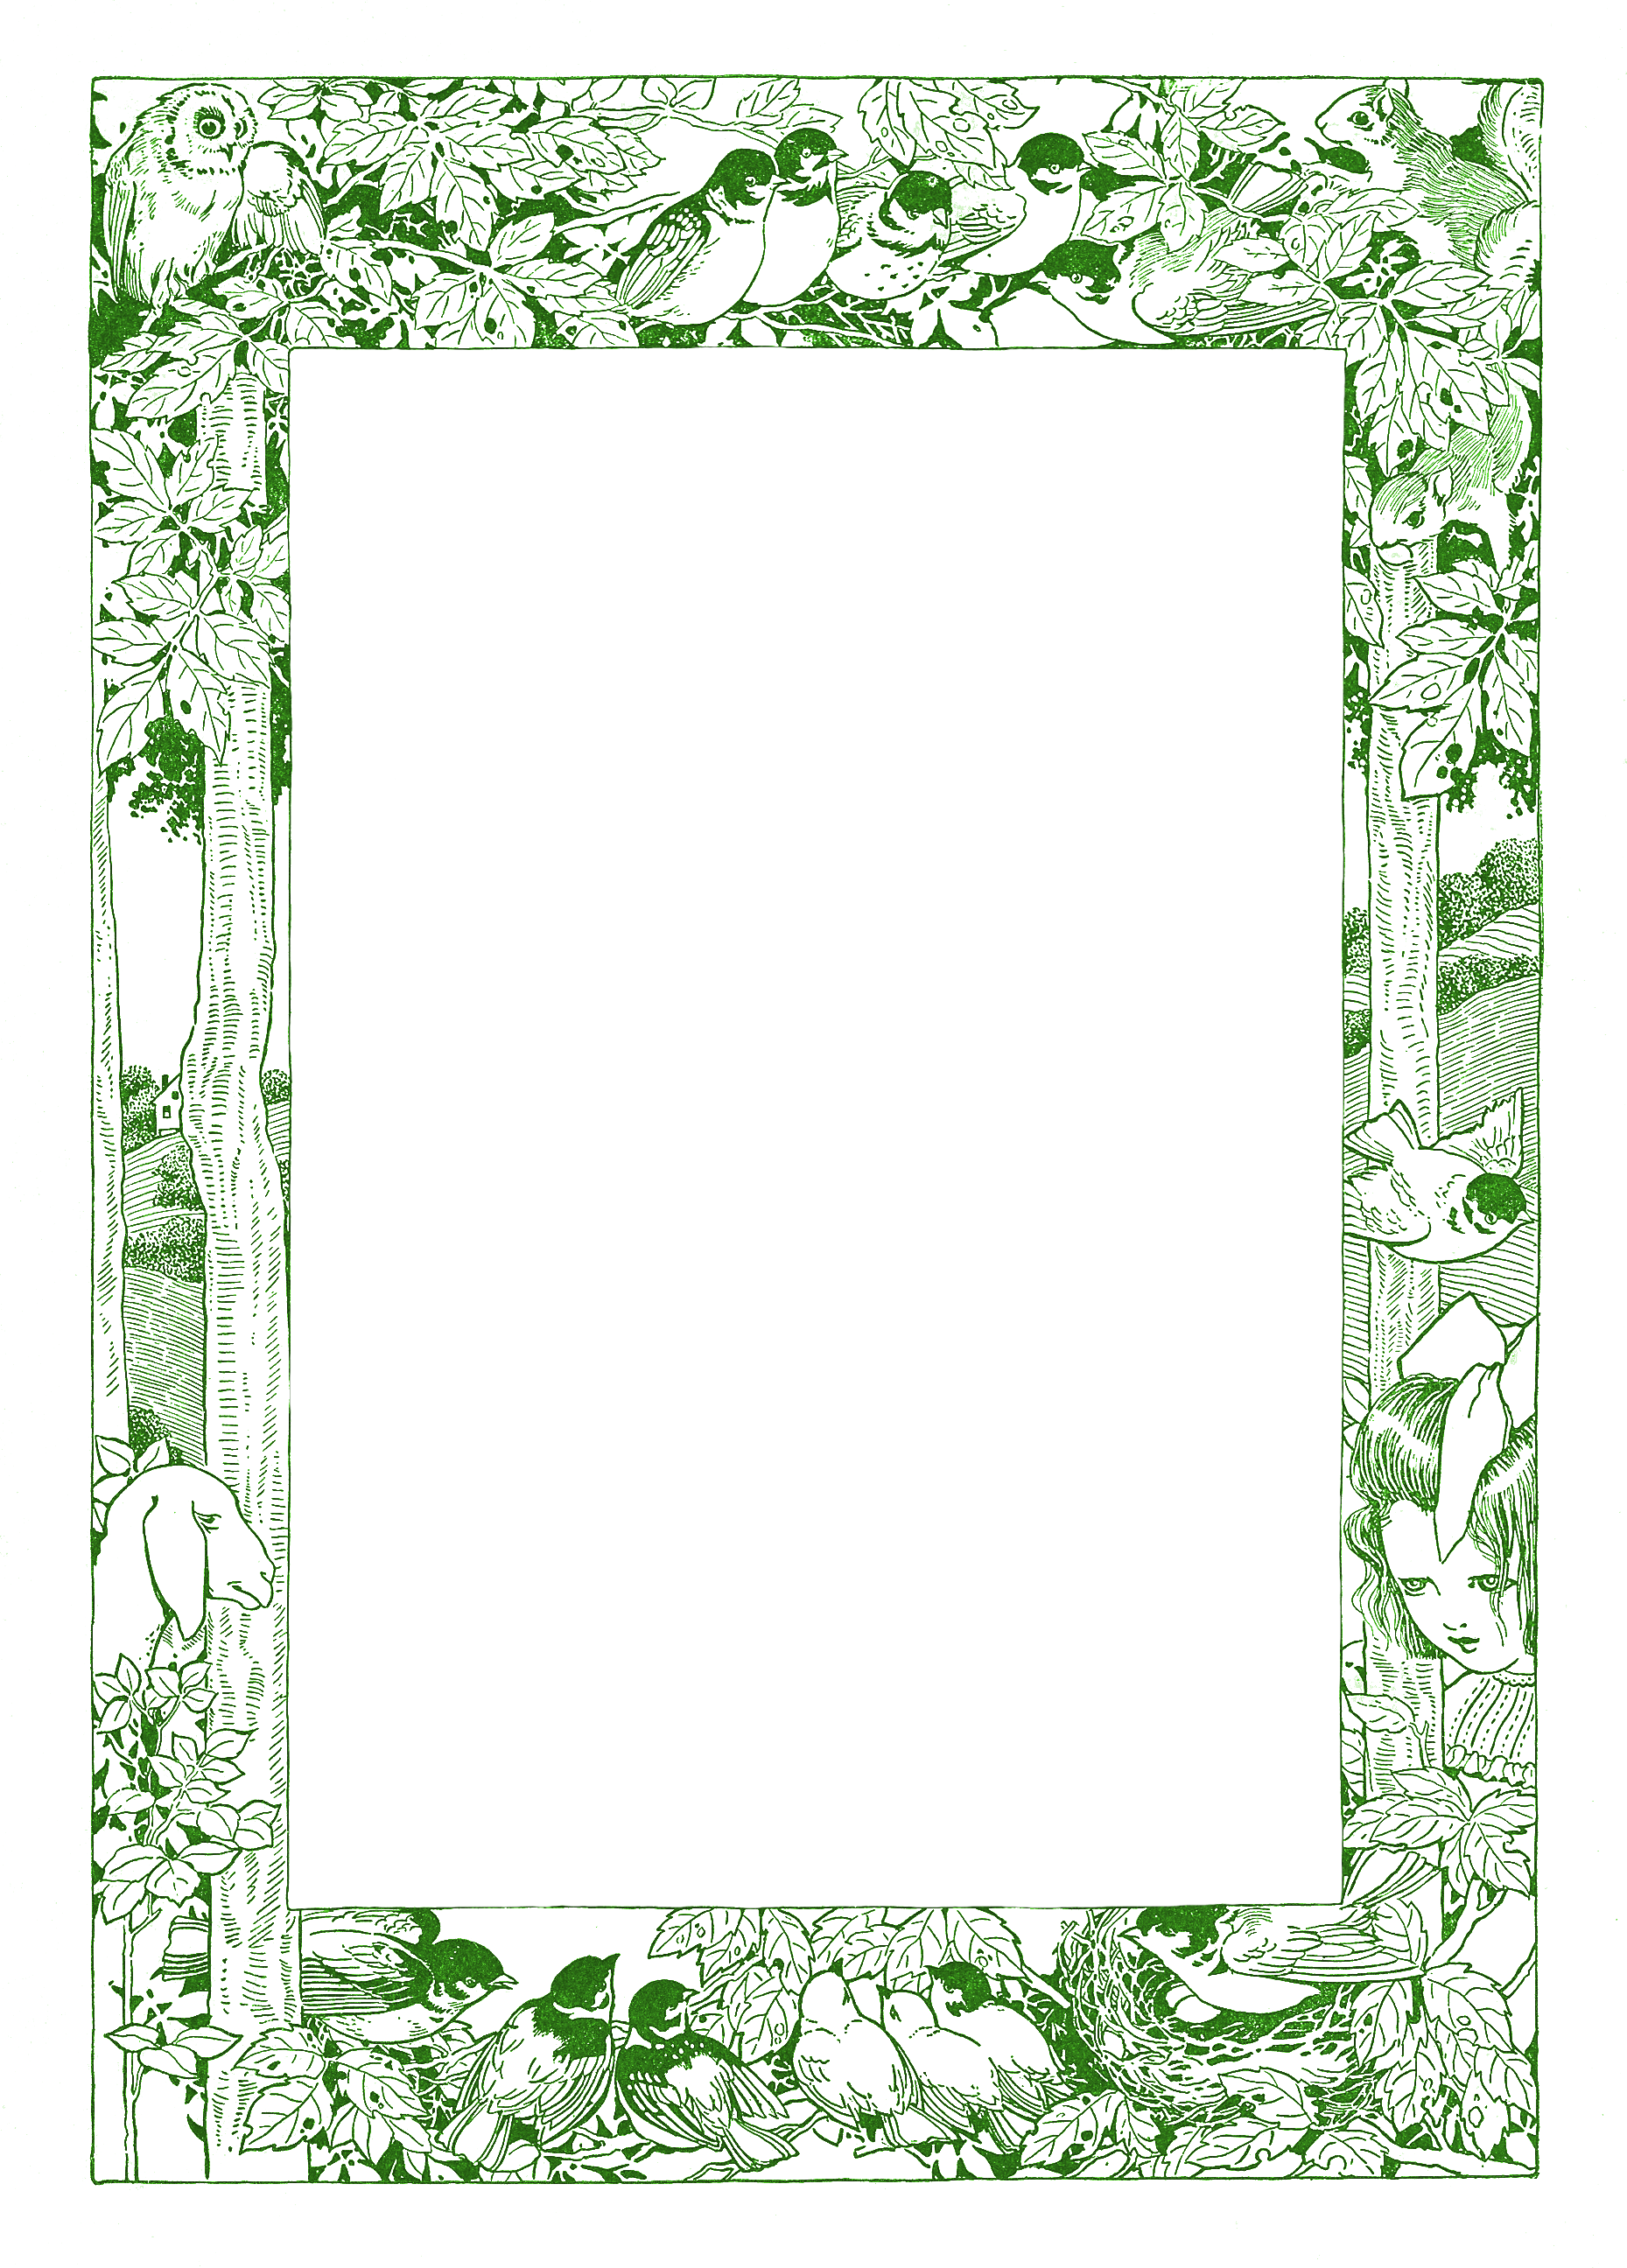 Transparent woodland clipart - Woodland Clipart Free - Transparent Background Vintage Page Frame Clipart